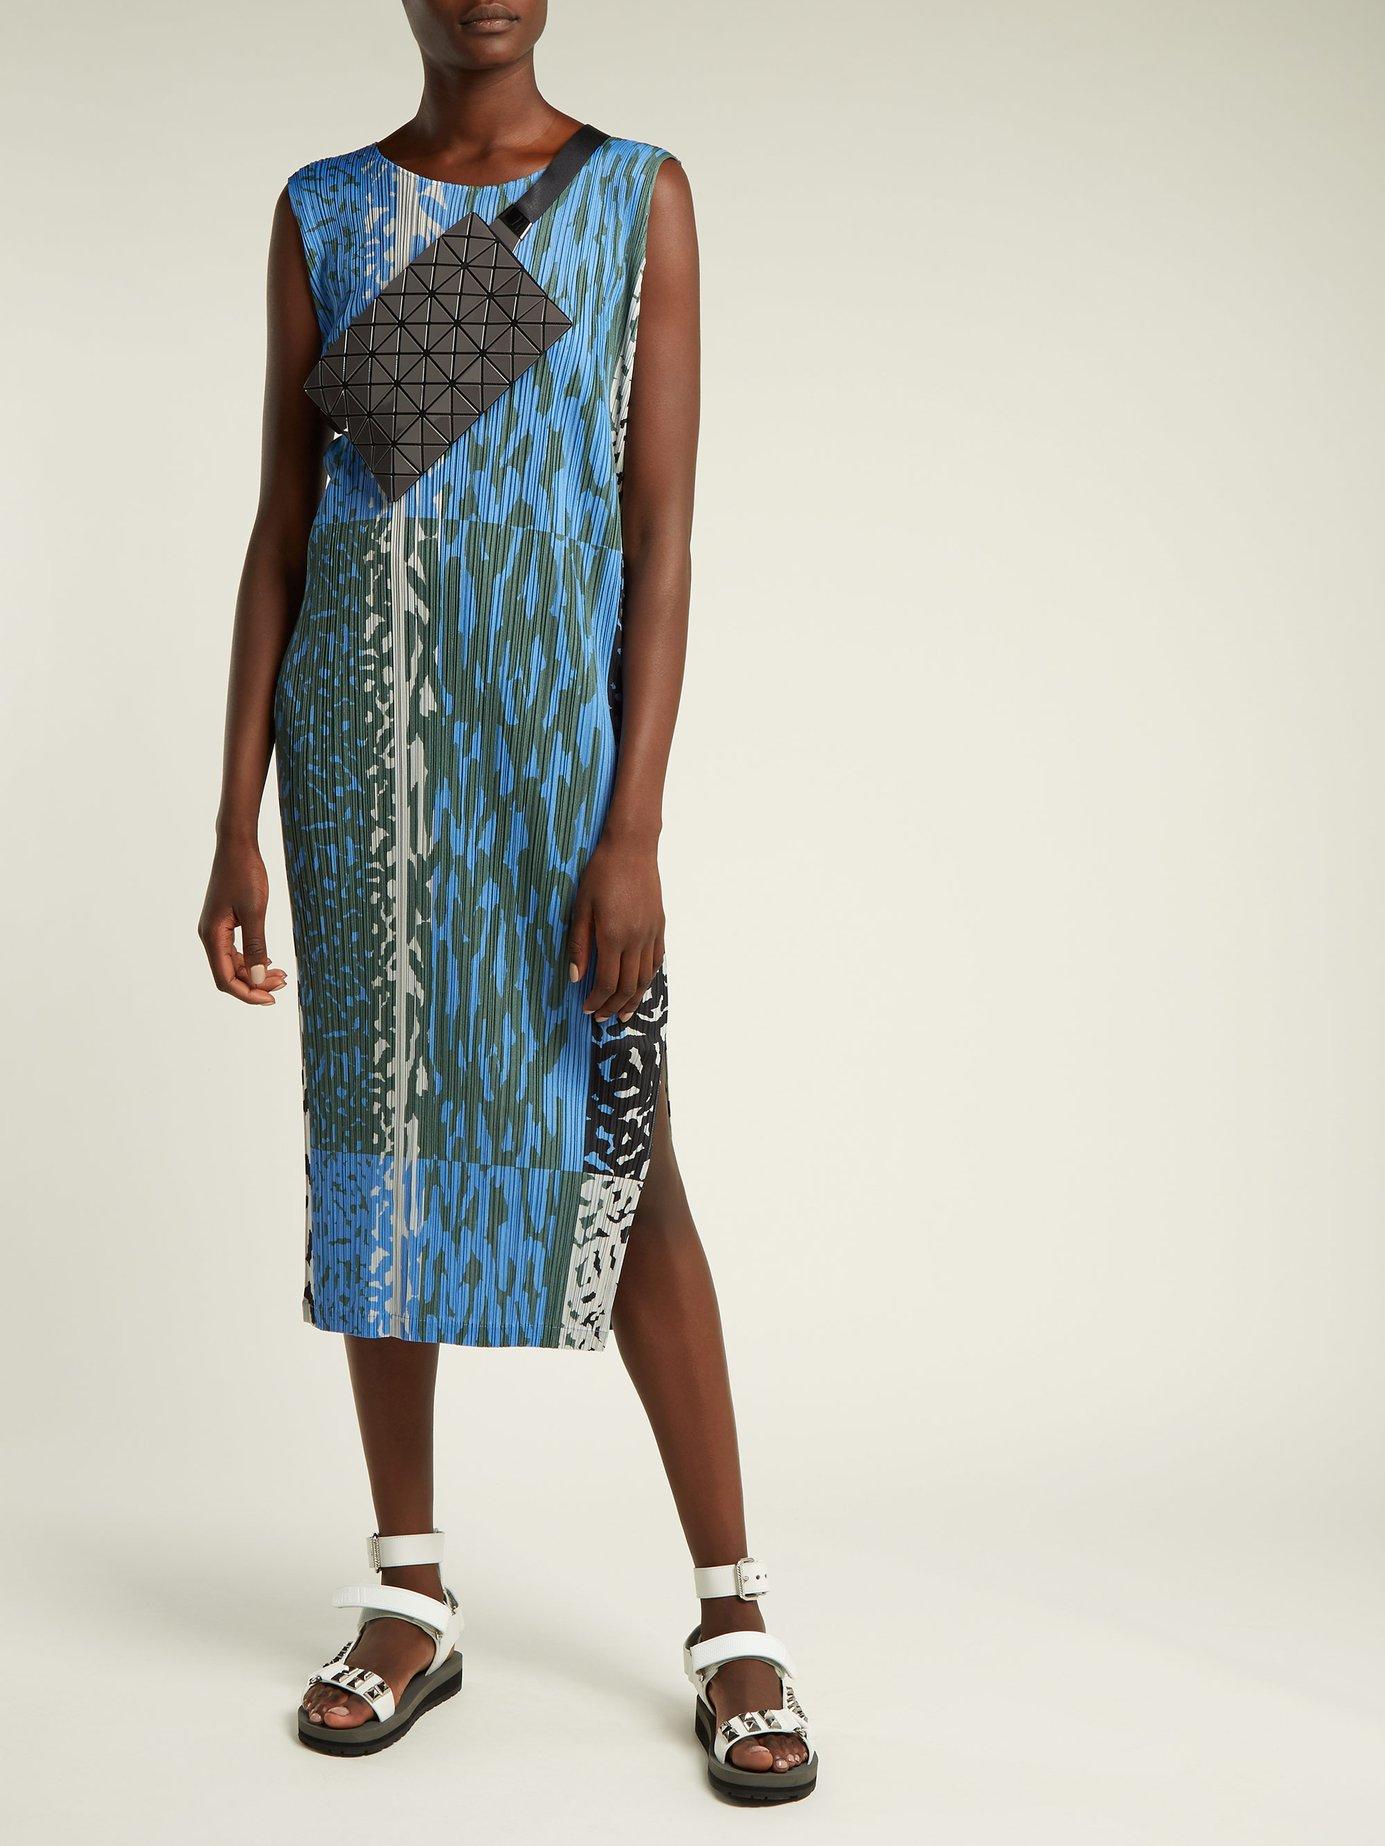 Animal-print pleated dress by Pleats Please Issey Miyake